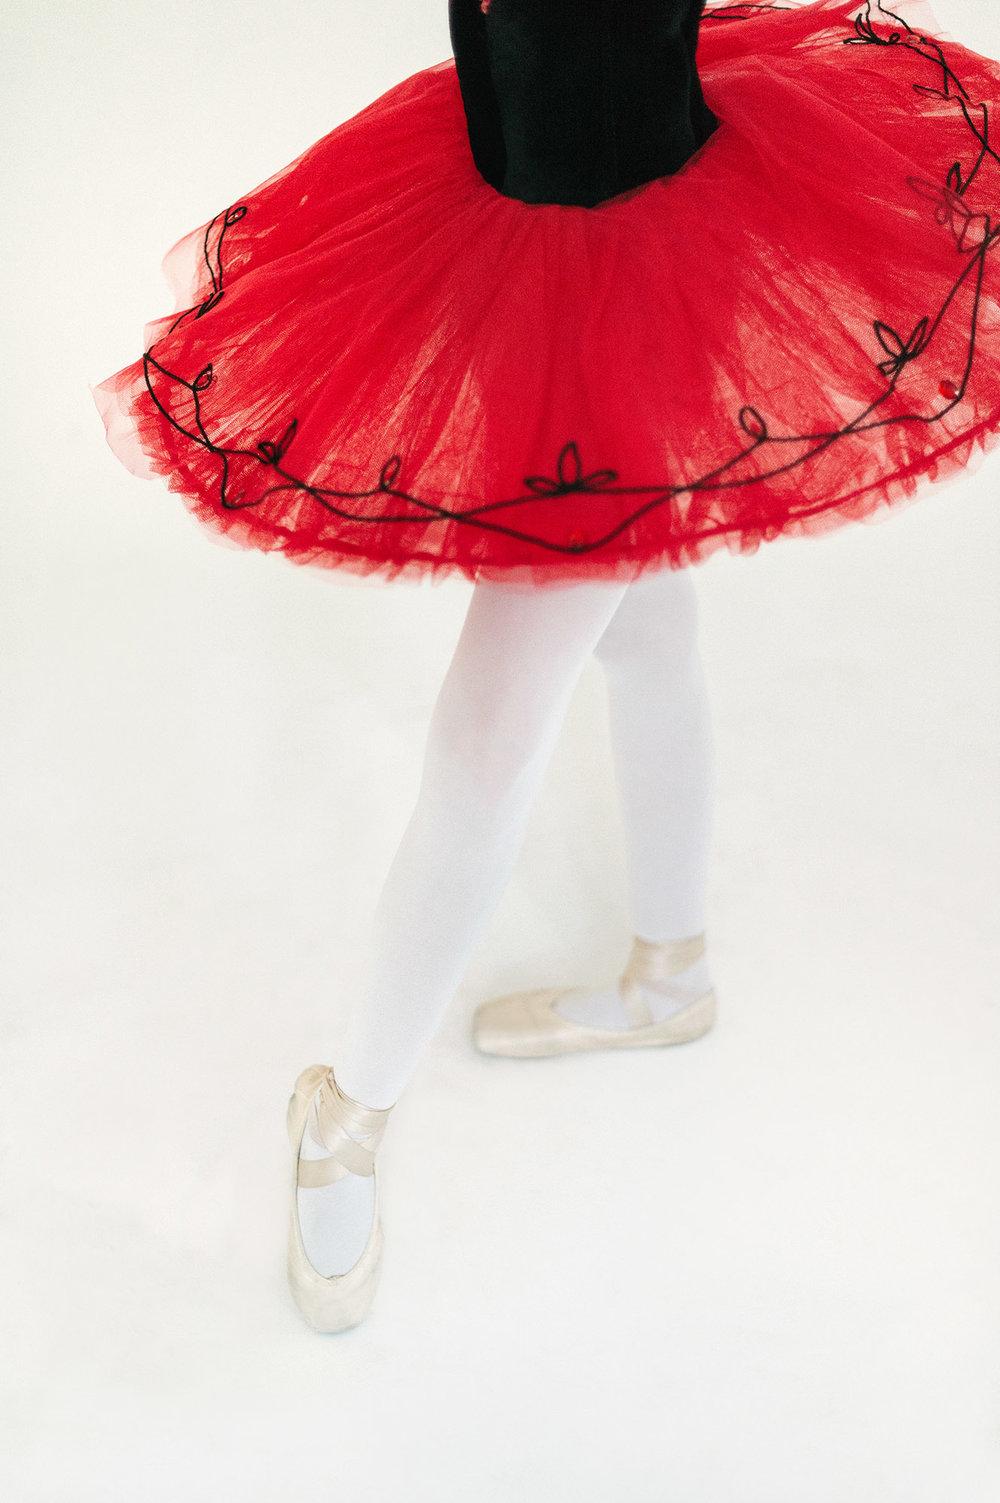 Cro&KowStudio_ballerina3.jpg